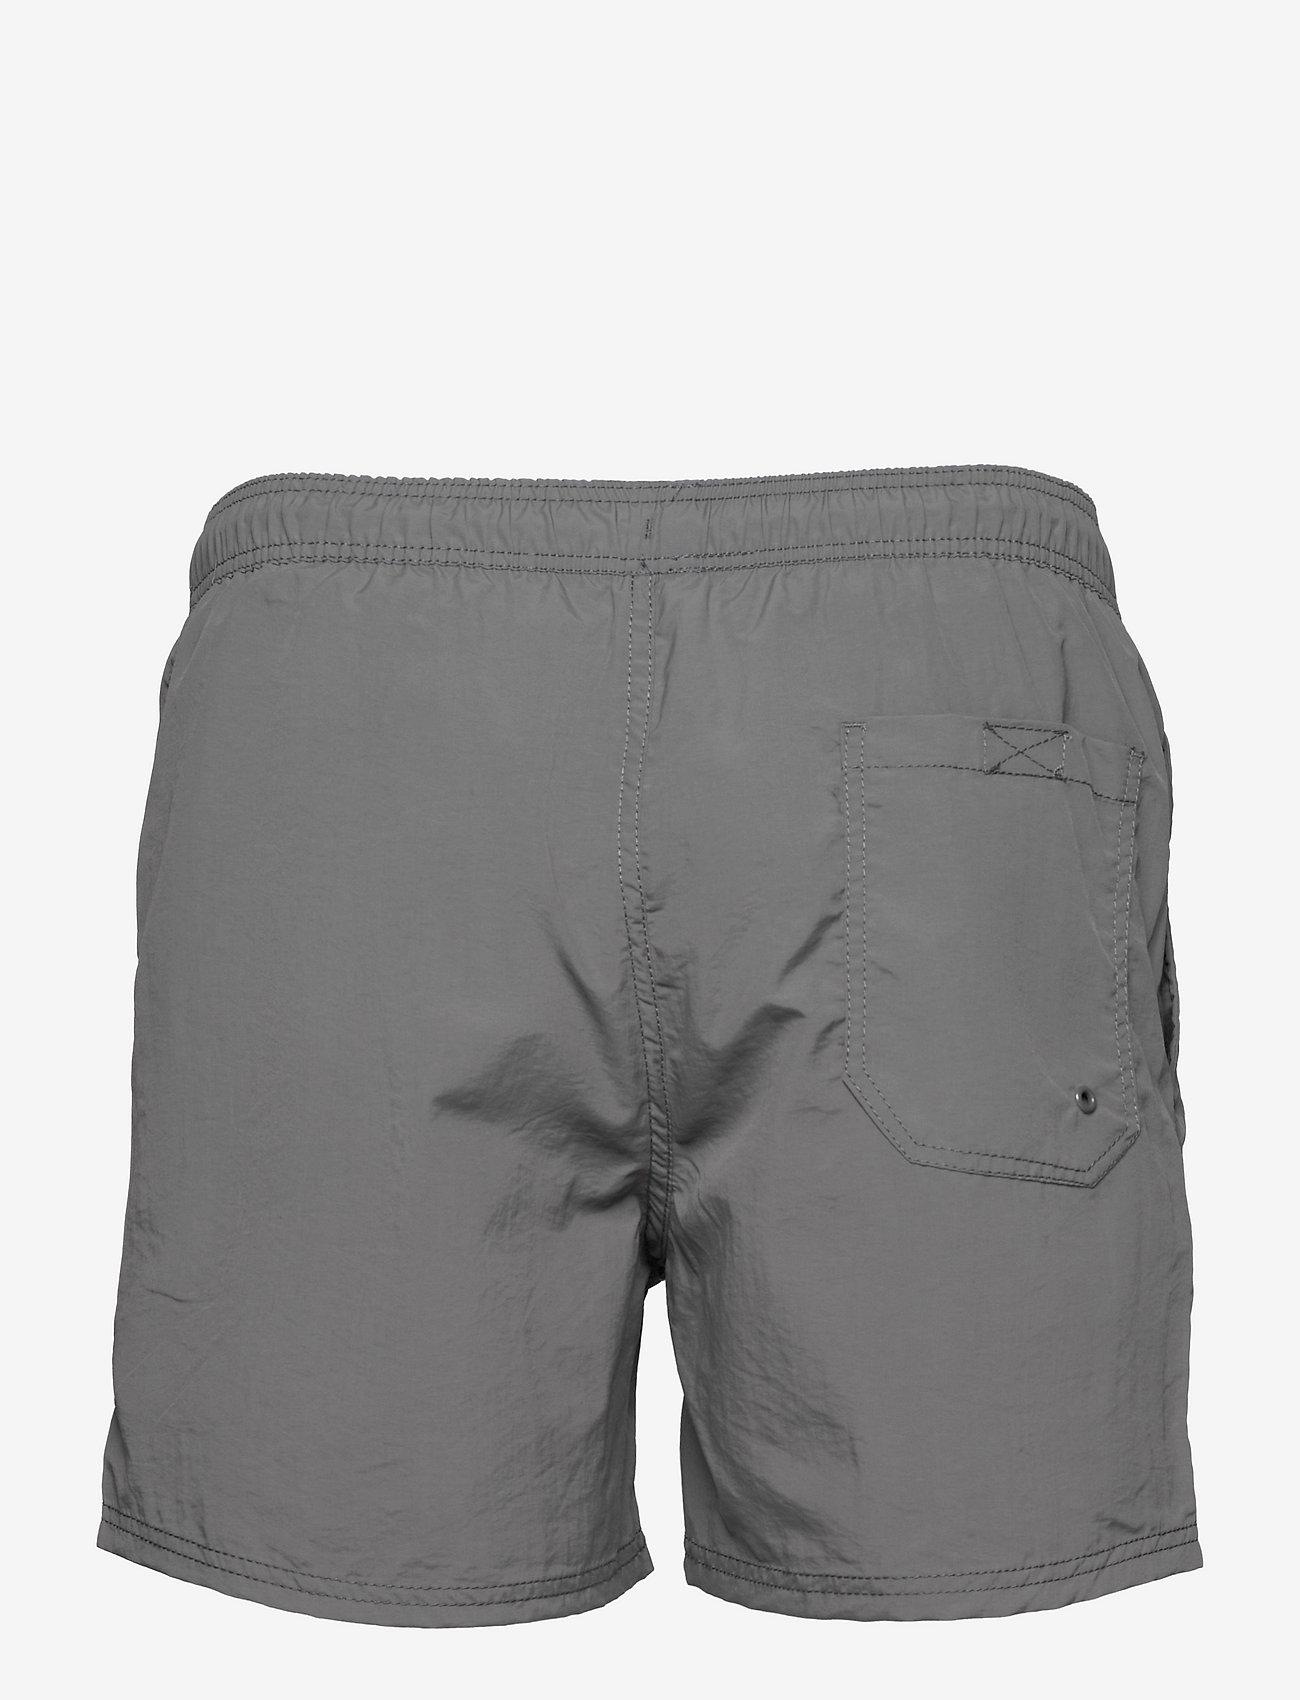 H2O - Leisure Swim Shorts - uimashortsit - dark grey - 1